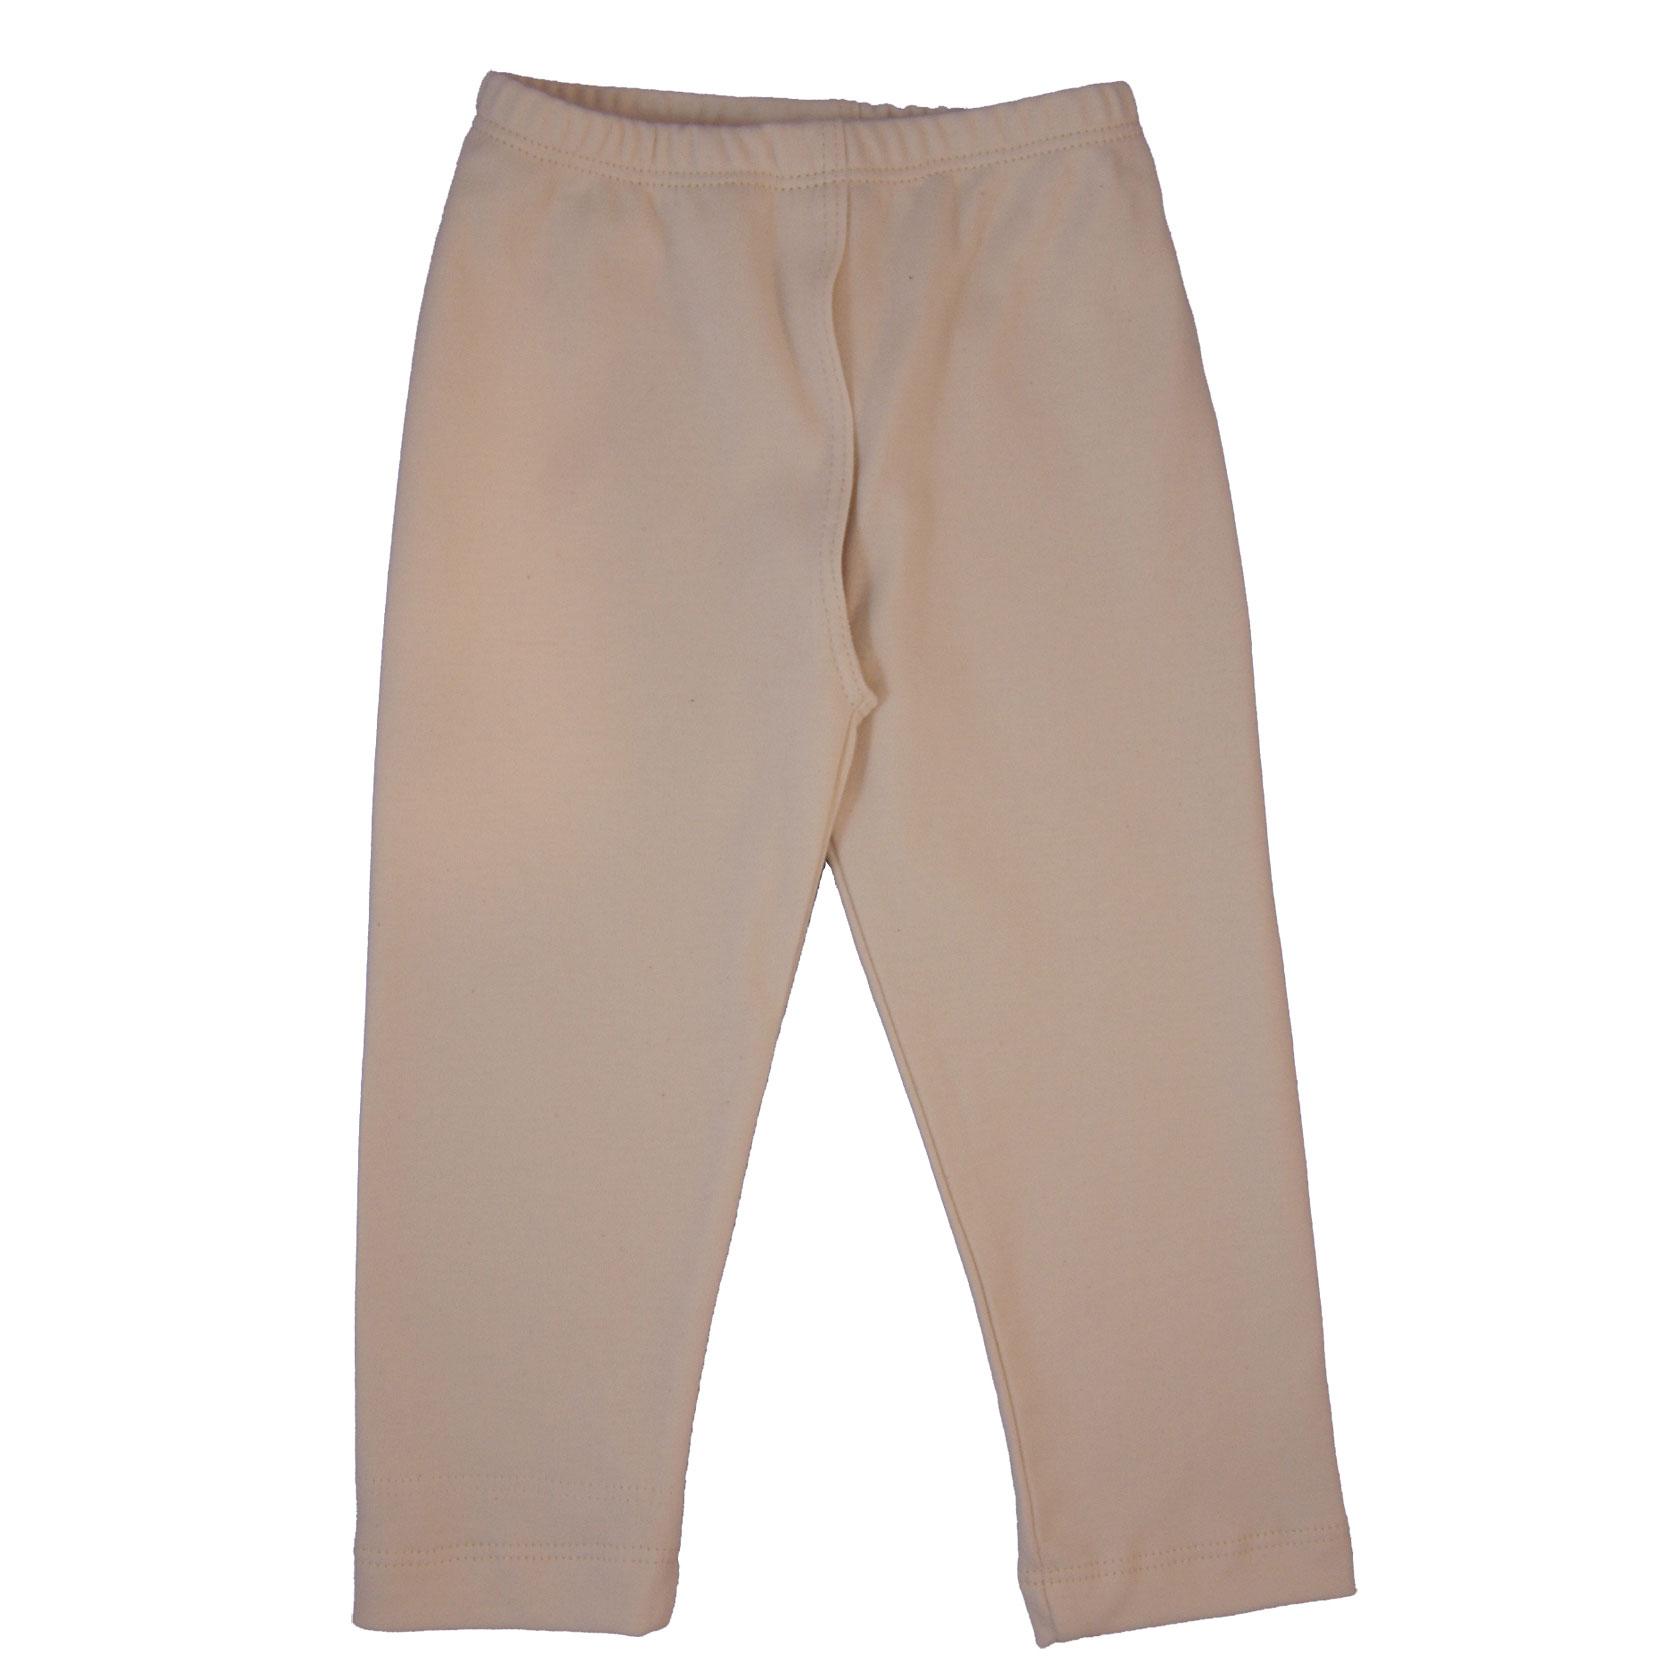 EC Wear Split Pants Natural Cotton on Model